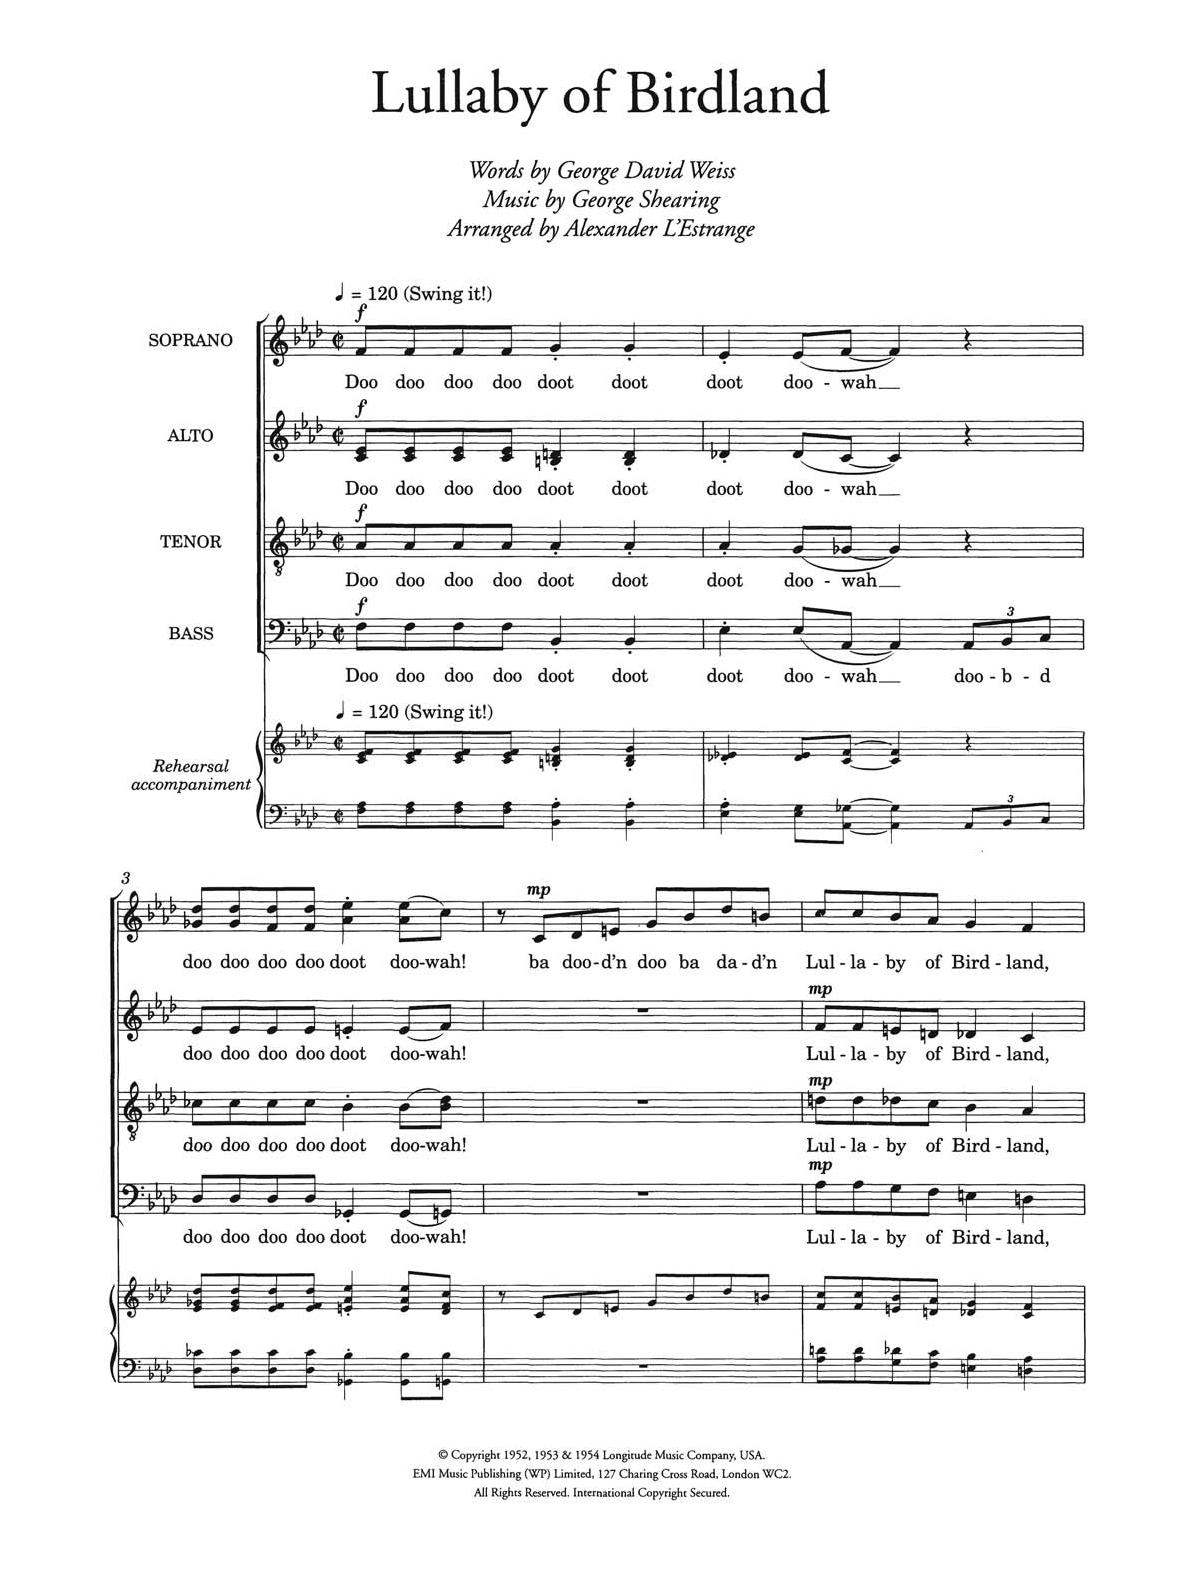 Ella Fitzgerald - Lullaby Of Birdland (arr. Alexander L'Estrange)